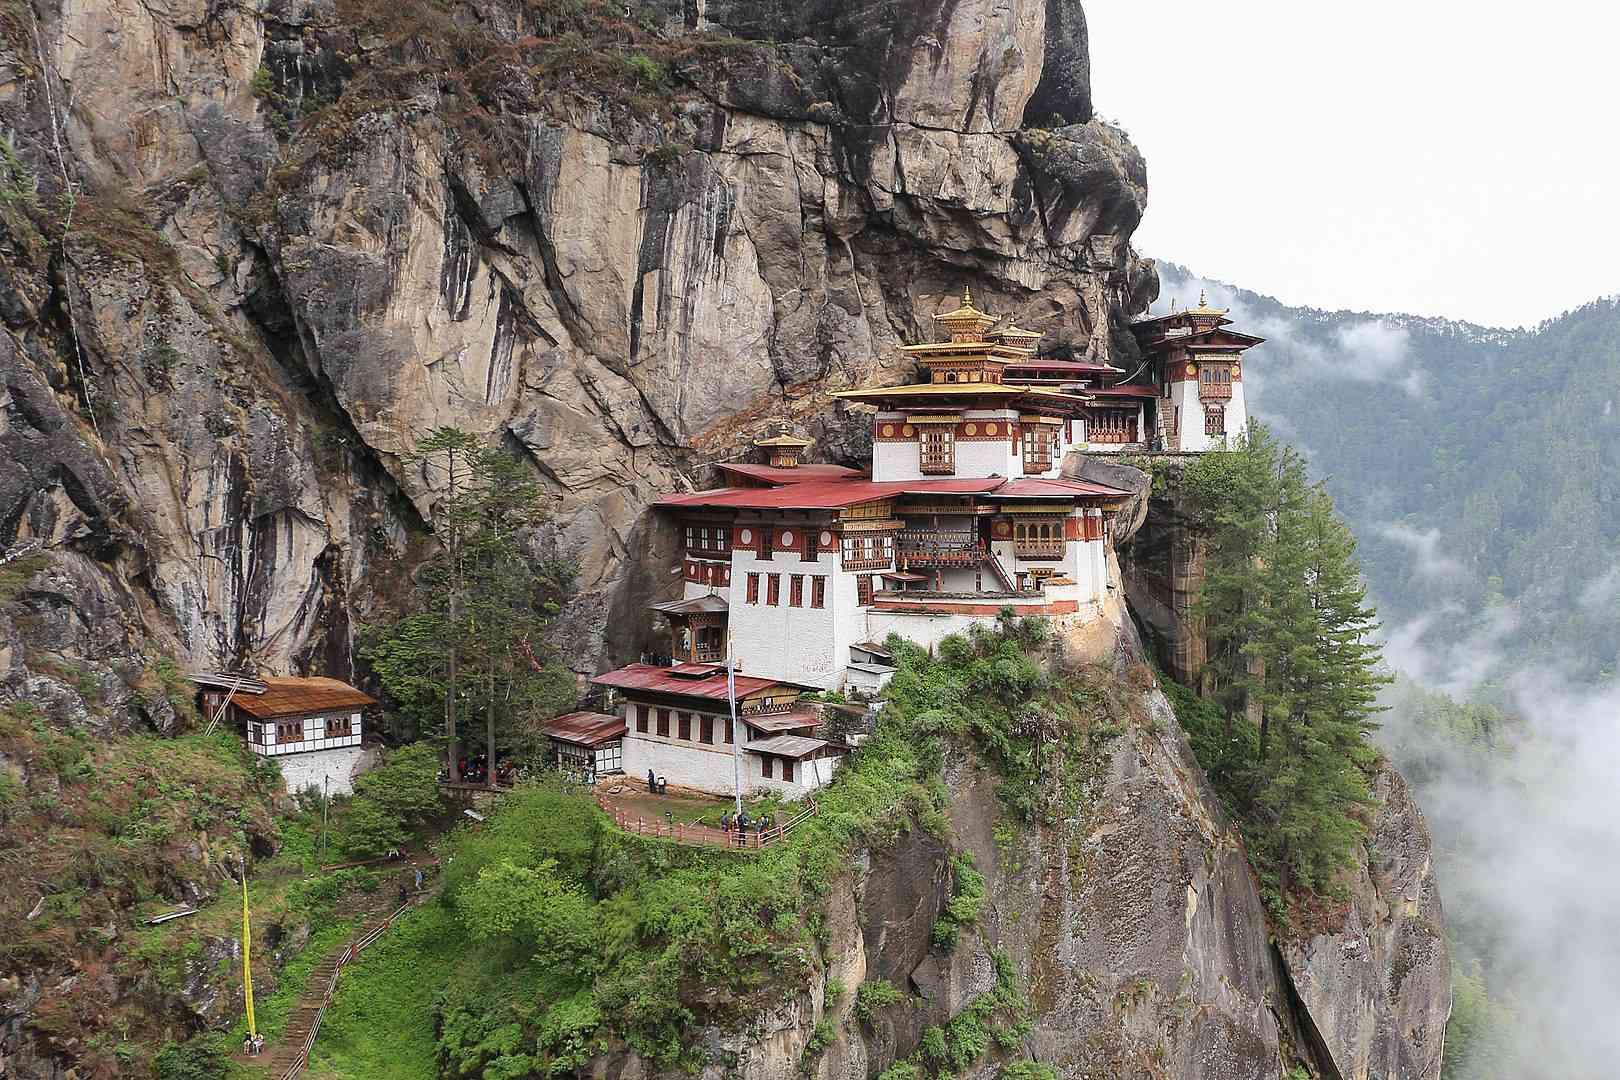 Paro Taktsang in the Paro Valley of Bhutan